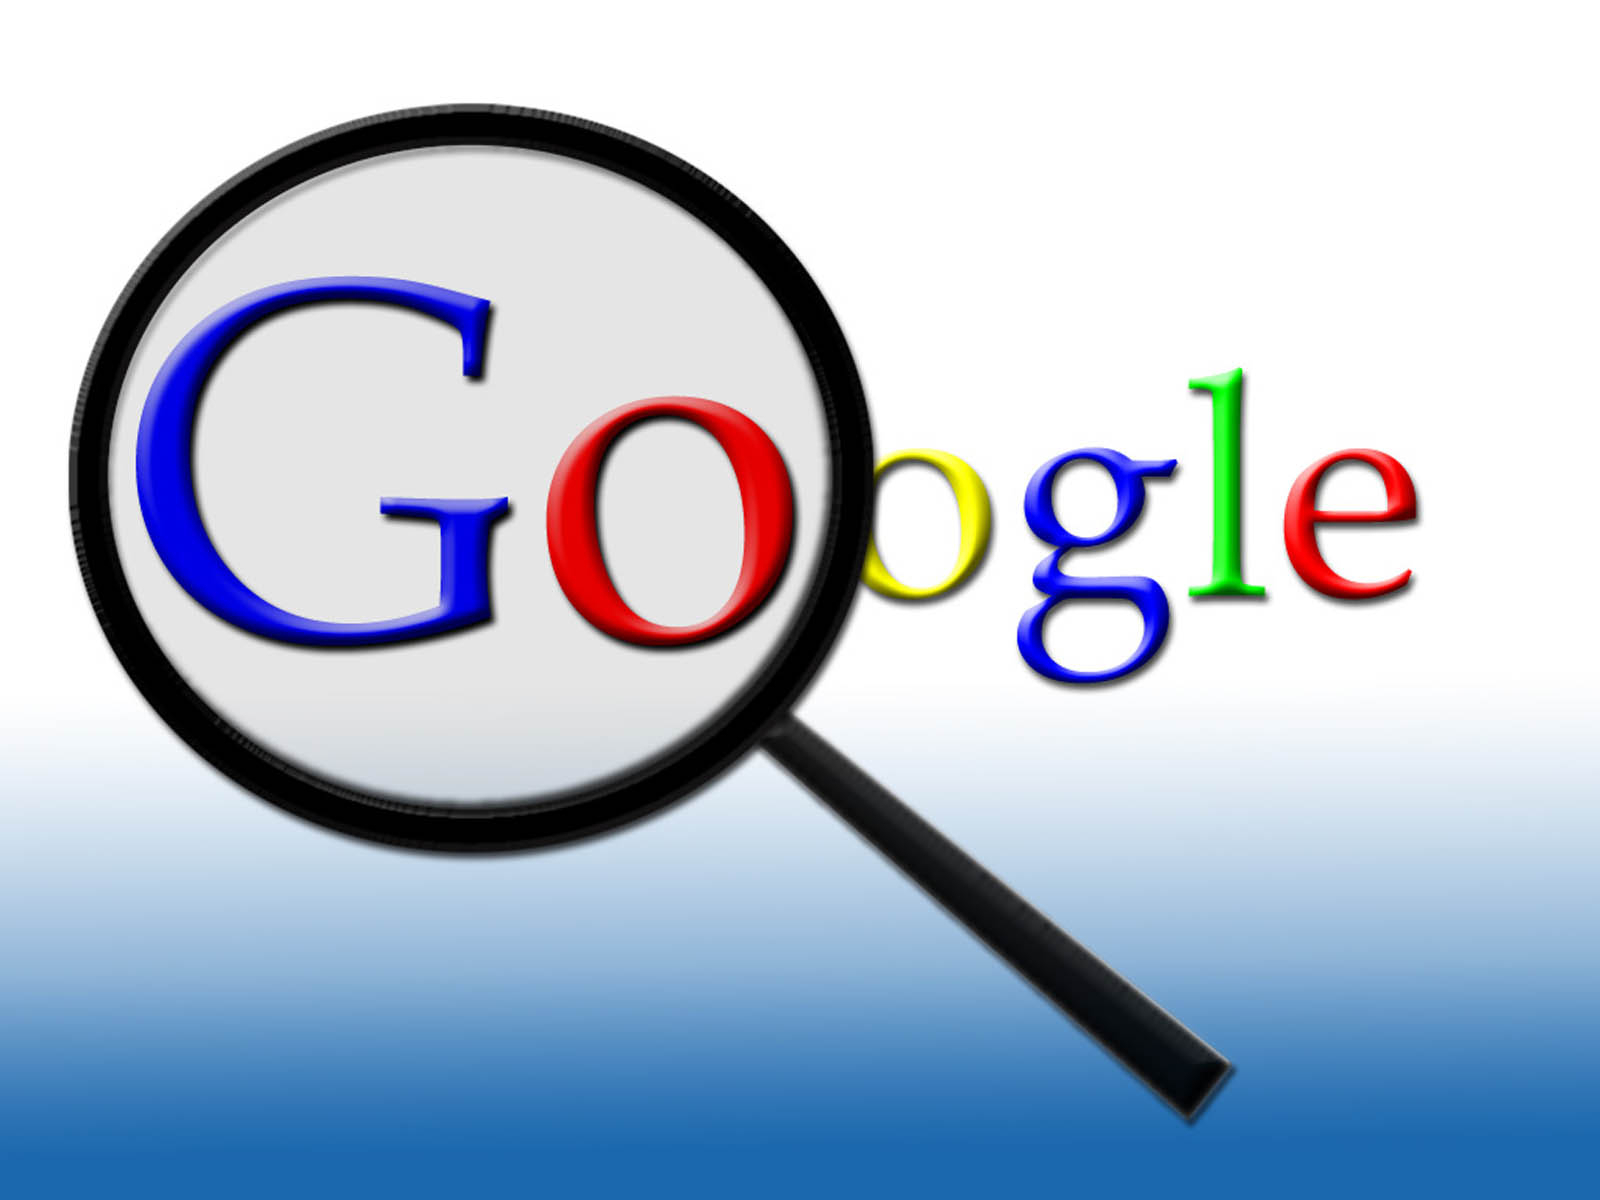 wallpaper: free google desktop wallpapers